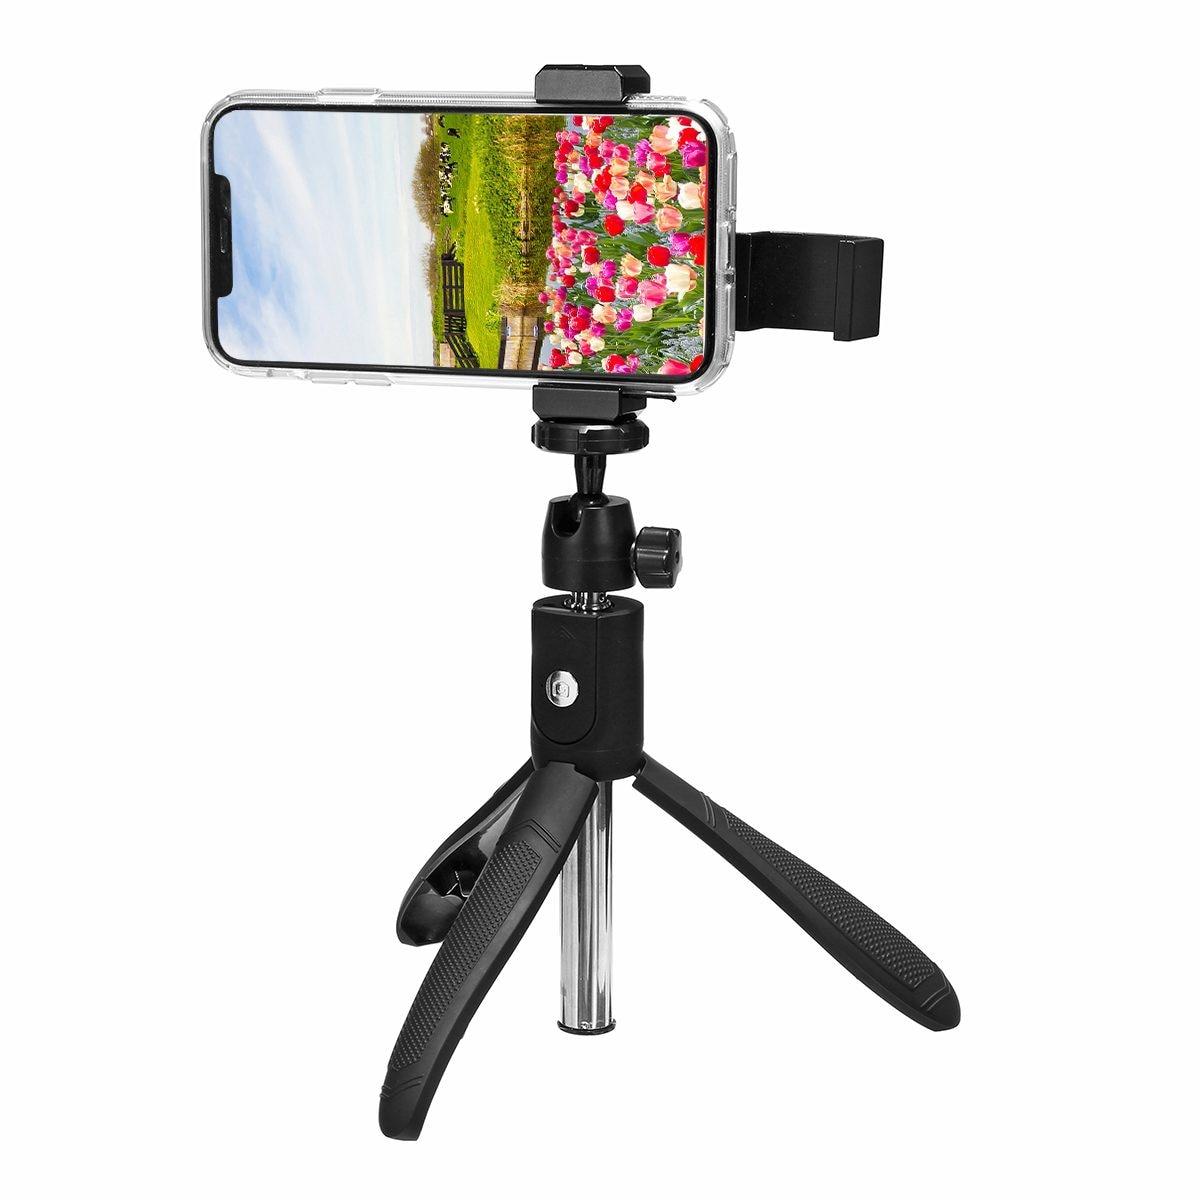 Titular de la base de soporte de bolsillo DJI OSMO soporte estable auto Disparador Selfie Stand